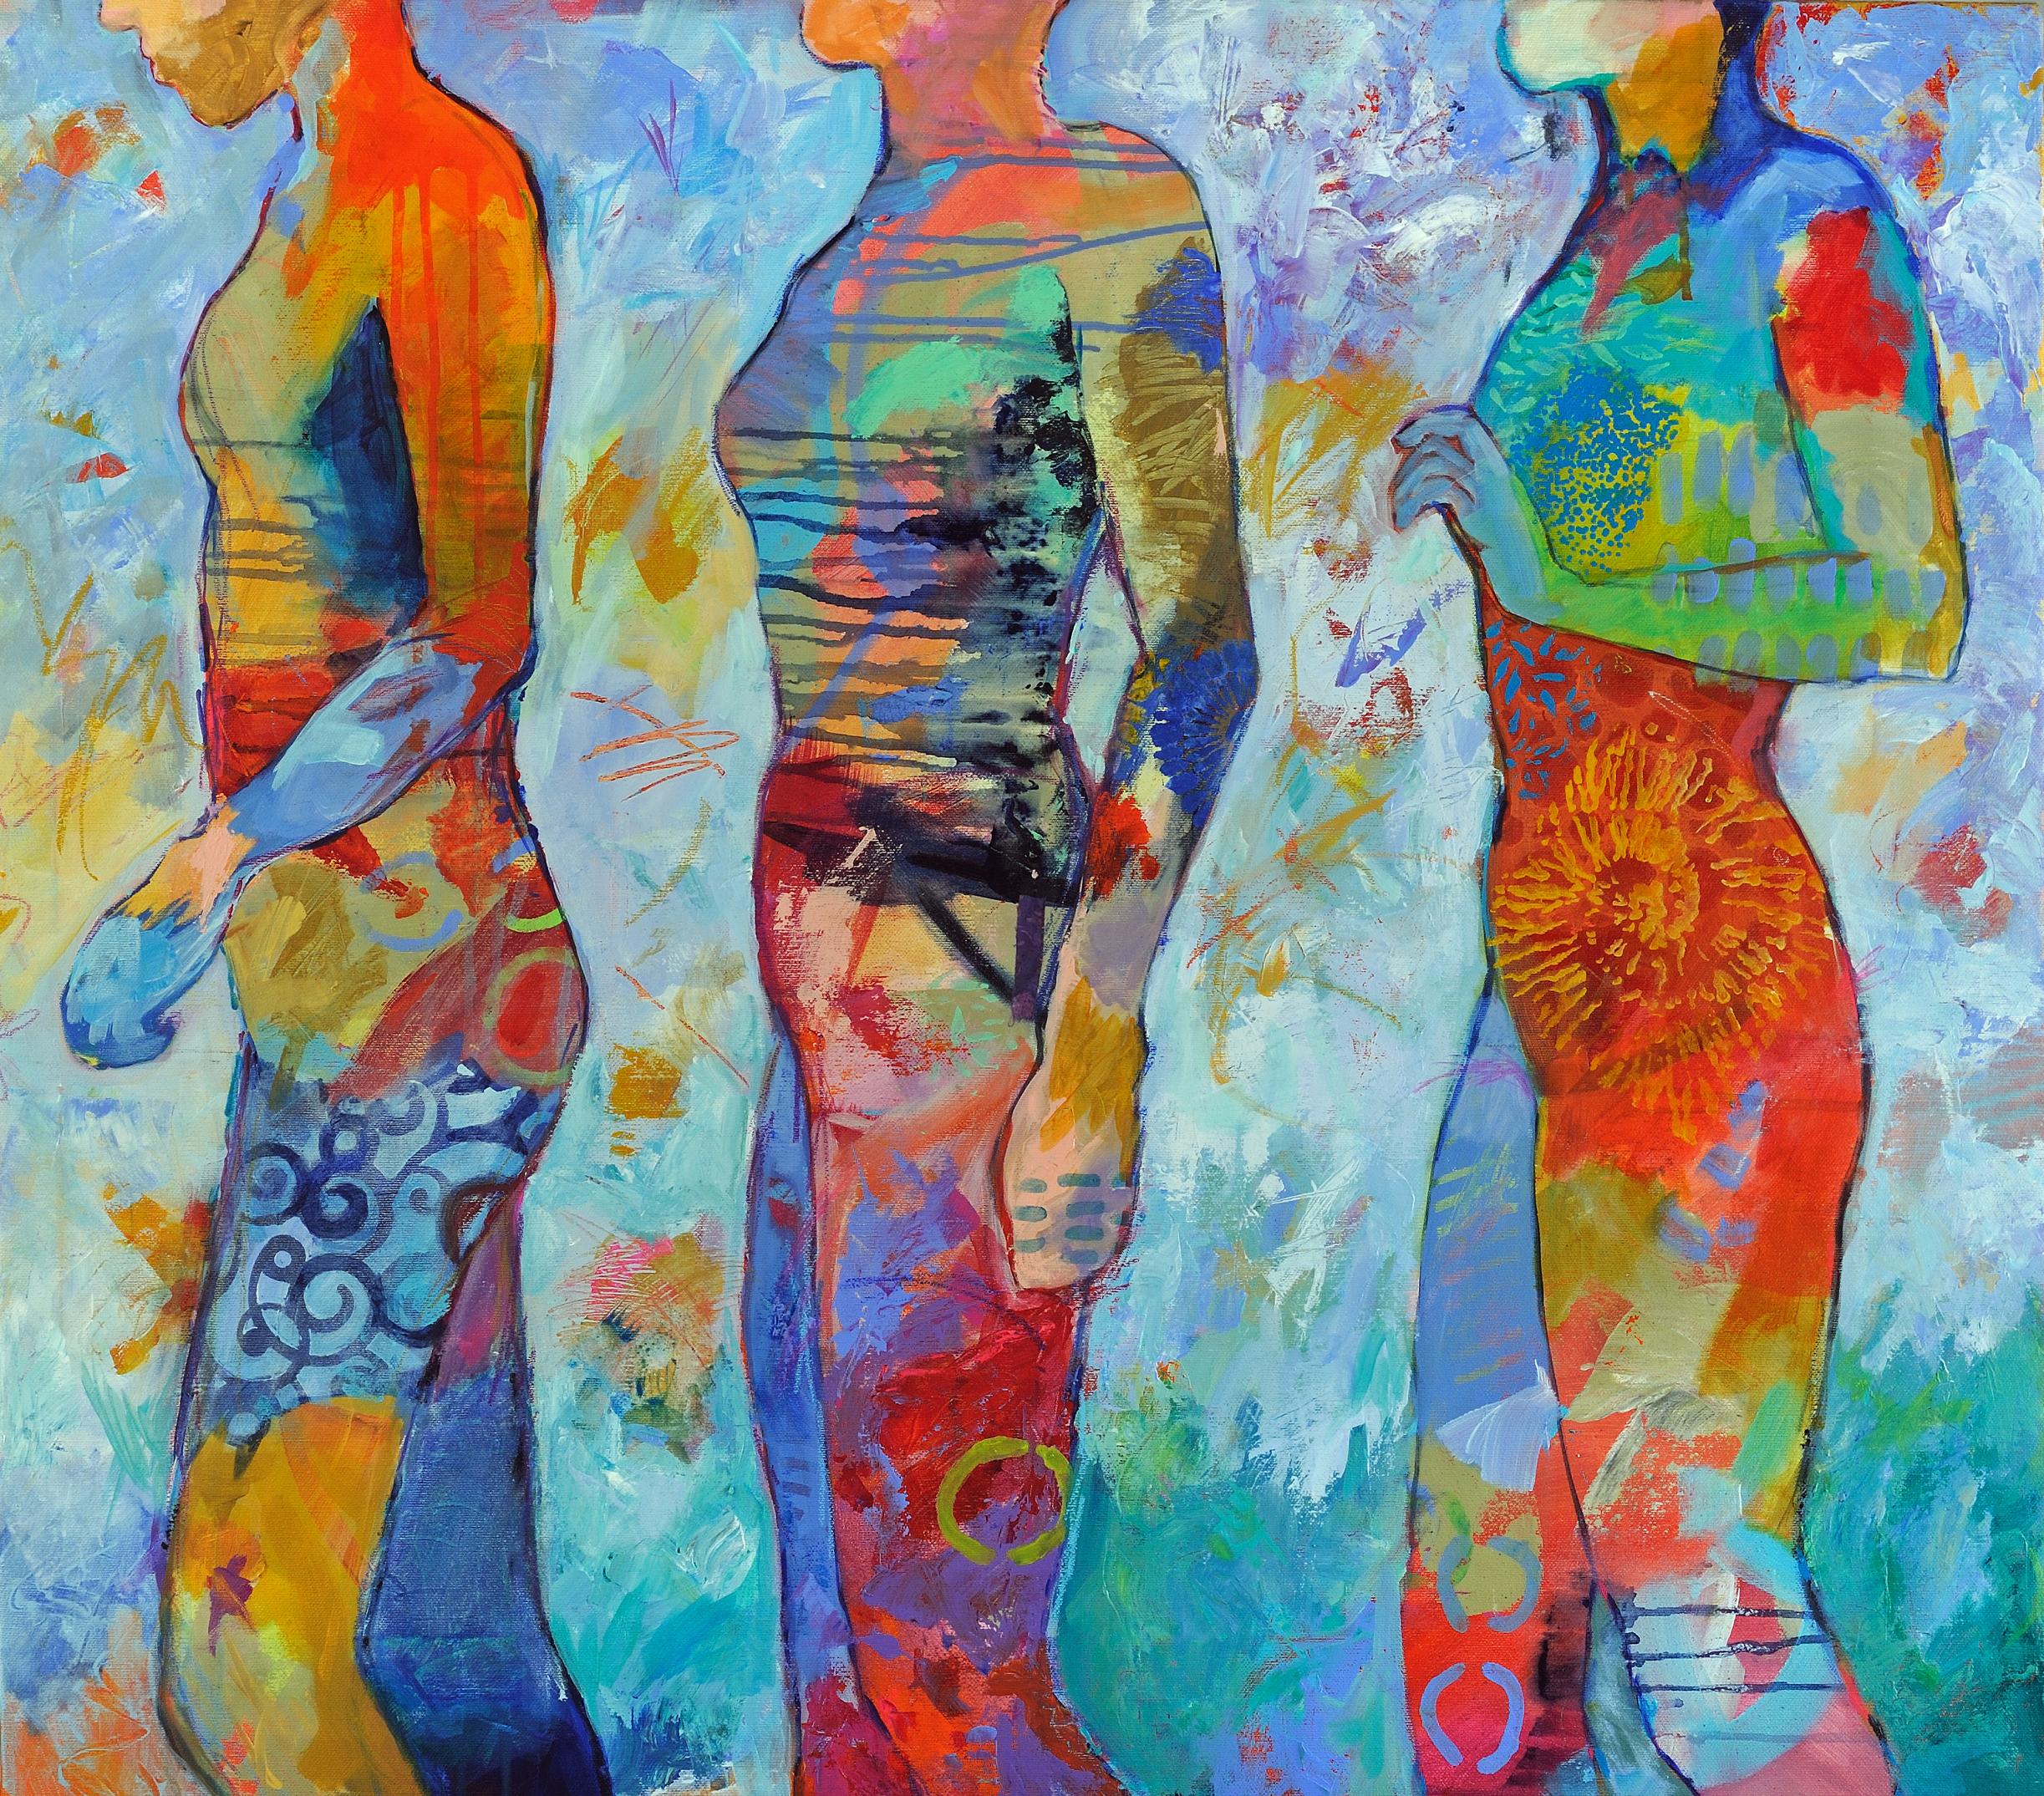 Rosa Vera_Passing Through_2018_Acrylic on canvas_30_ x 34__$1800.jpg